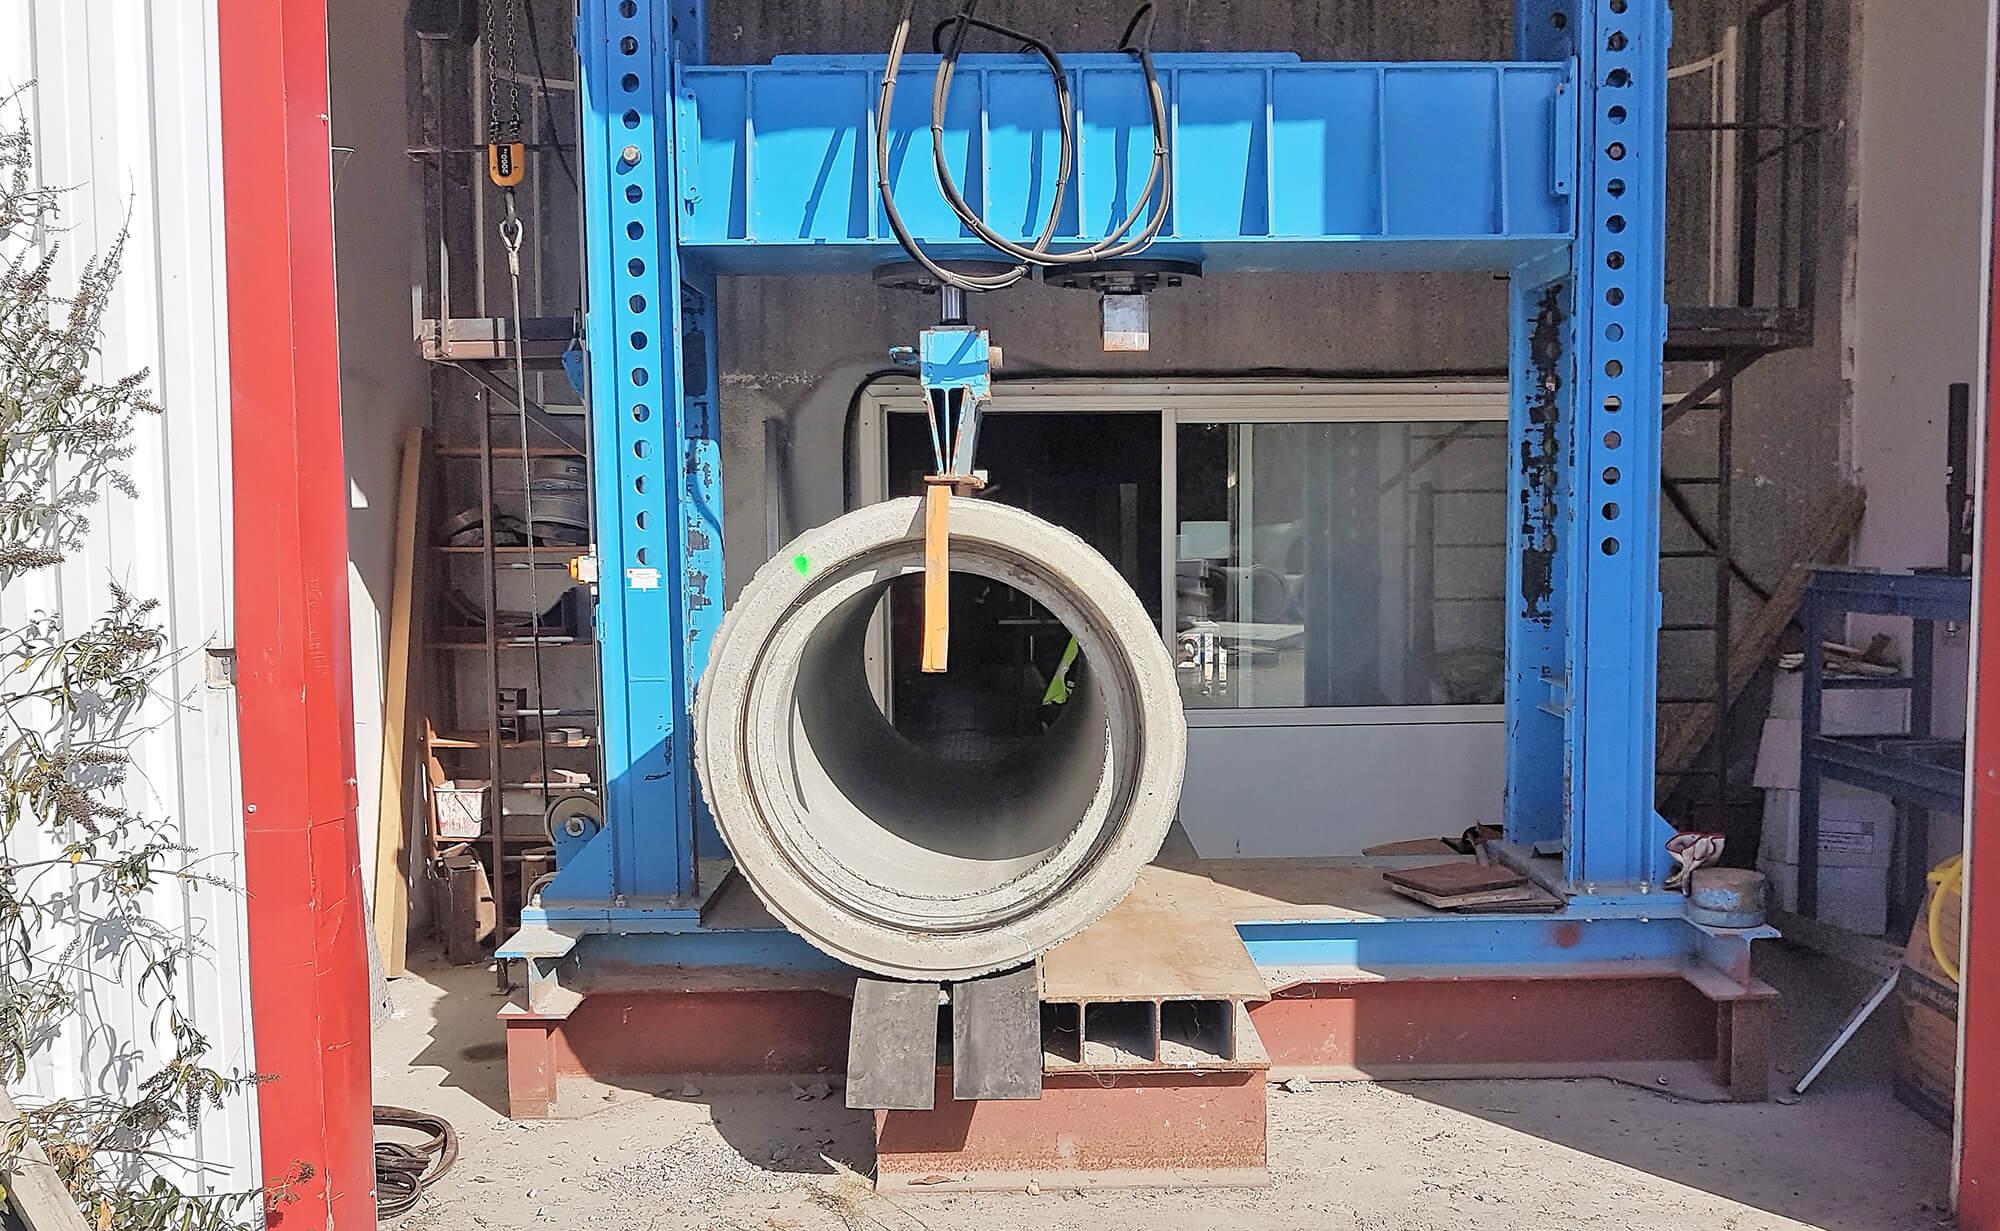 Essai mécanique tuyau béton